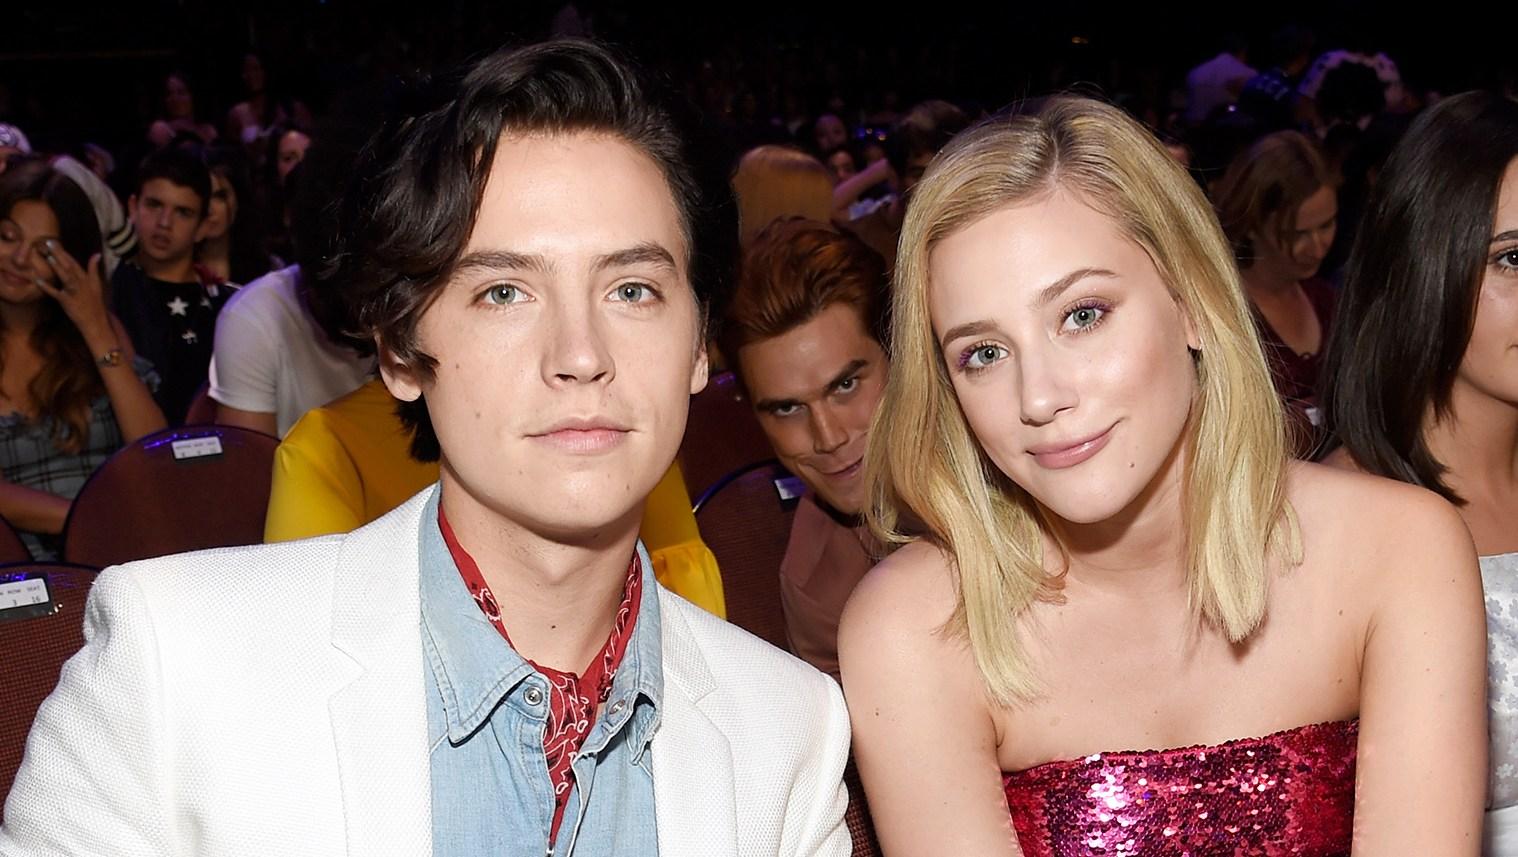 Inside Teen Choice Awards 2018 KJ Apa photobomb Cole Sprouse Lili Reinhart